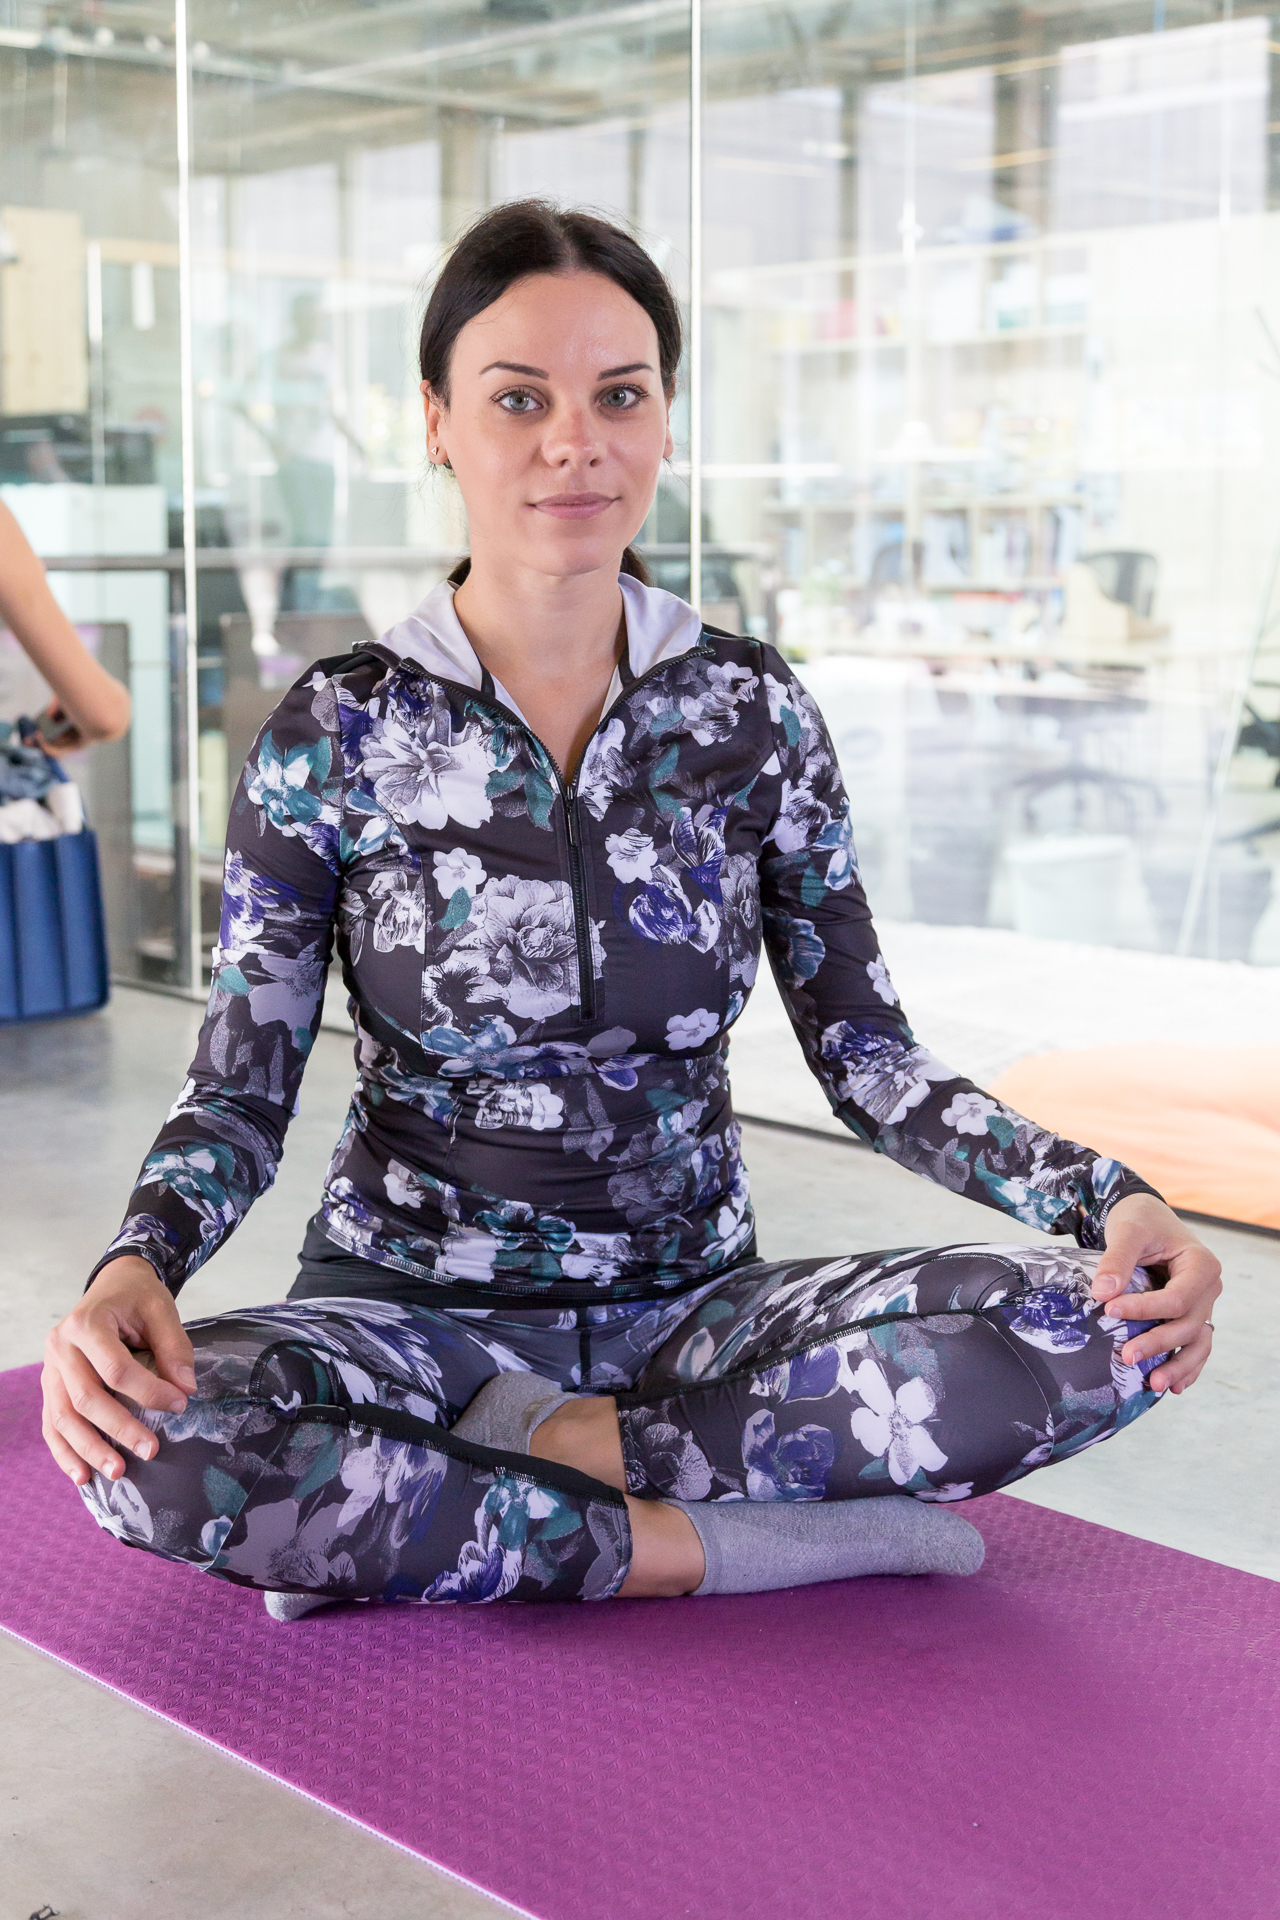 elena-schiavon-yoga-zalando